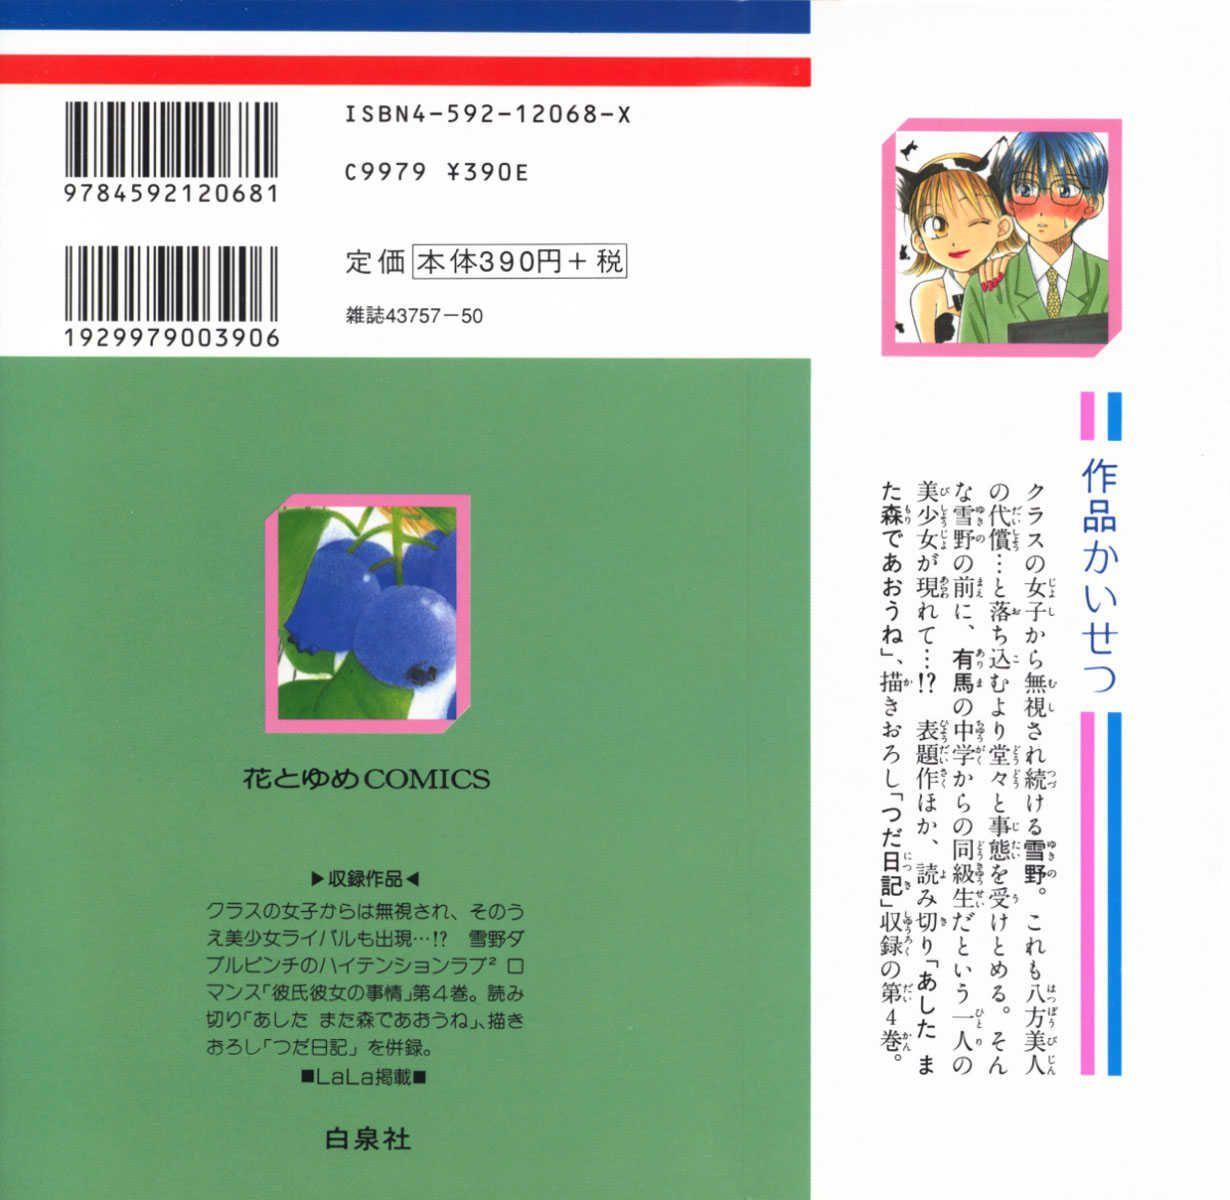 Kare kano ch 13 manga read kare kano ch 13 manga online for Kare schweiz